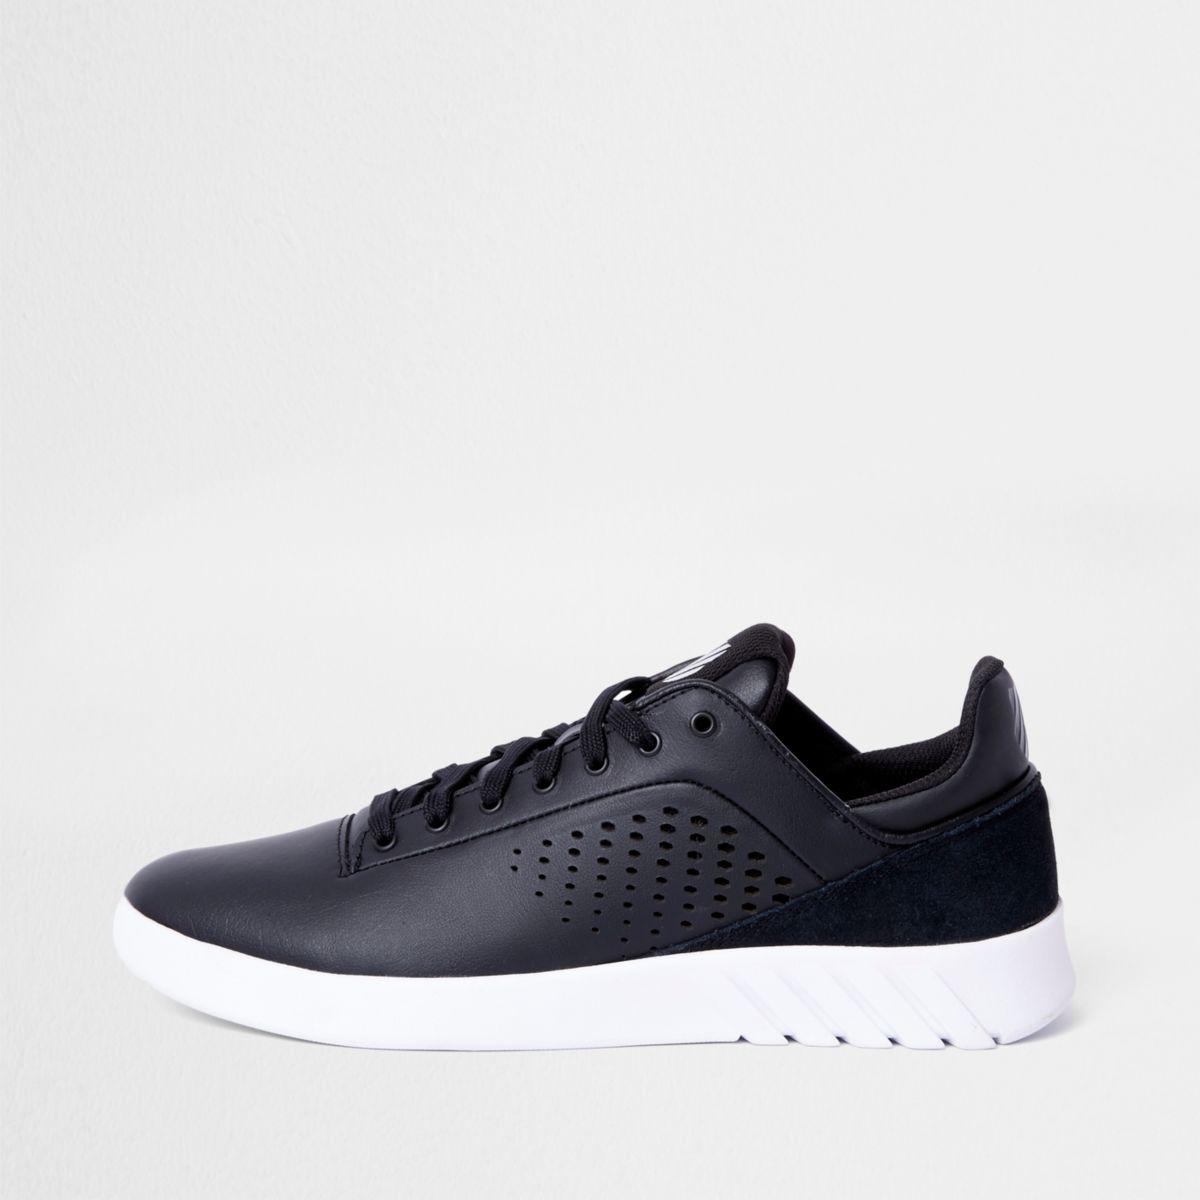 K-Swiss black lightweight runner sneakers